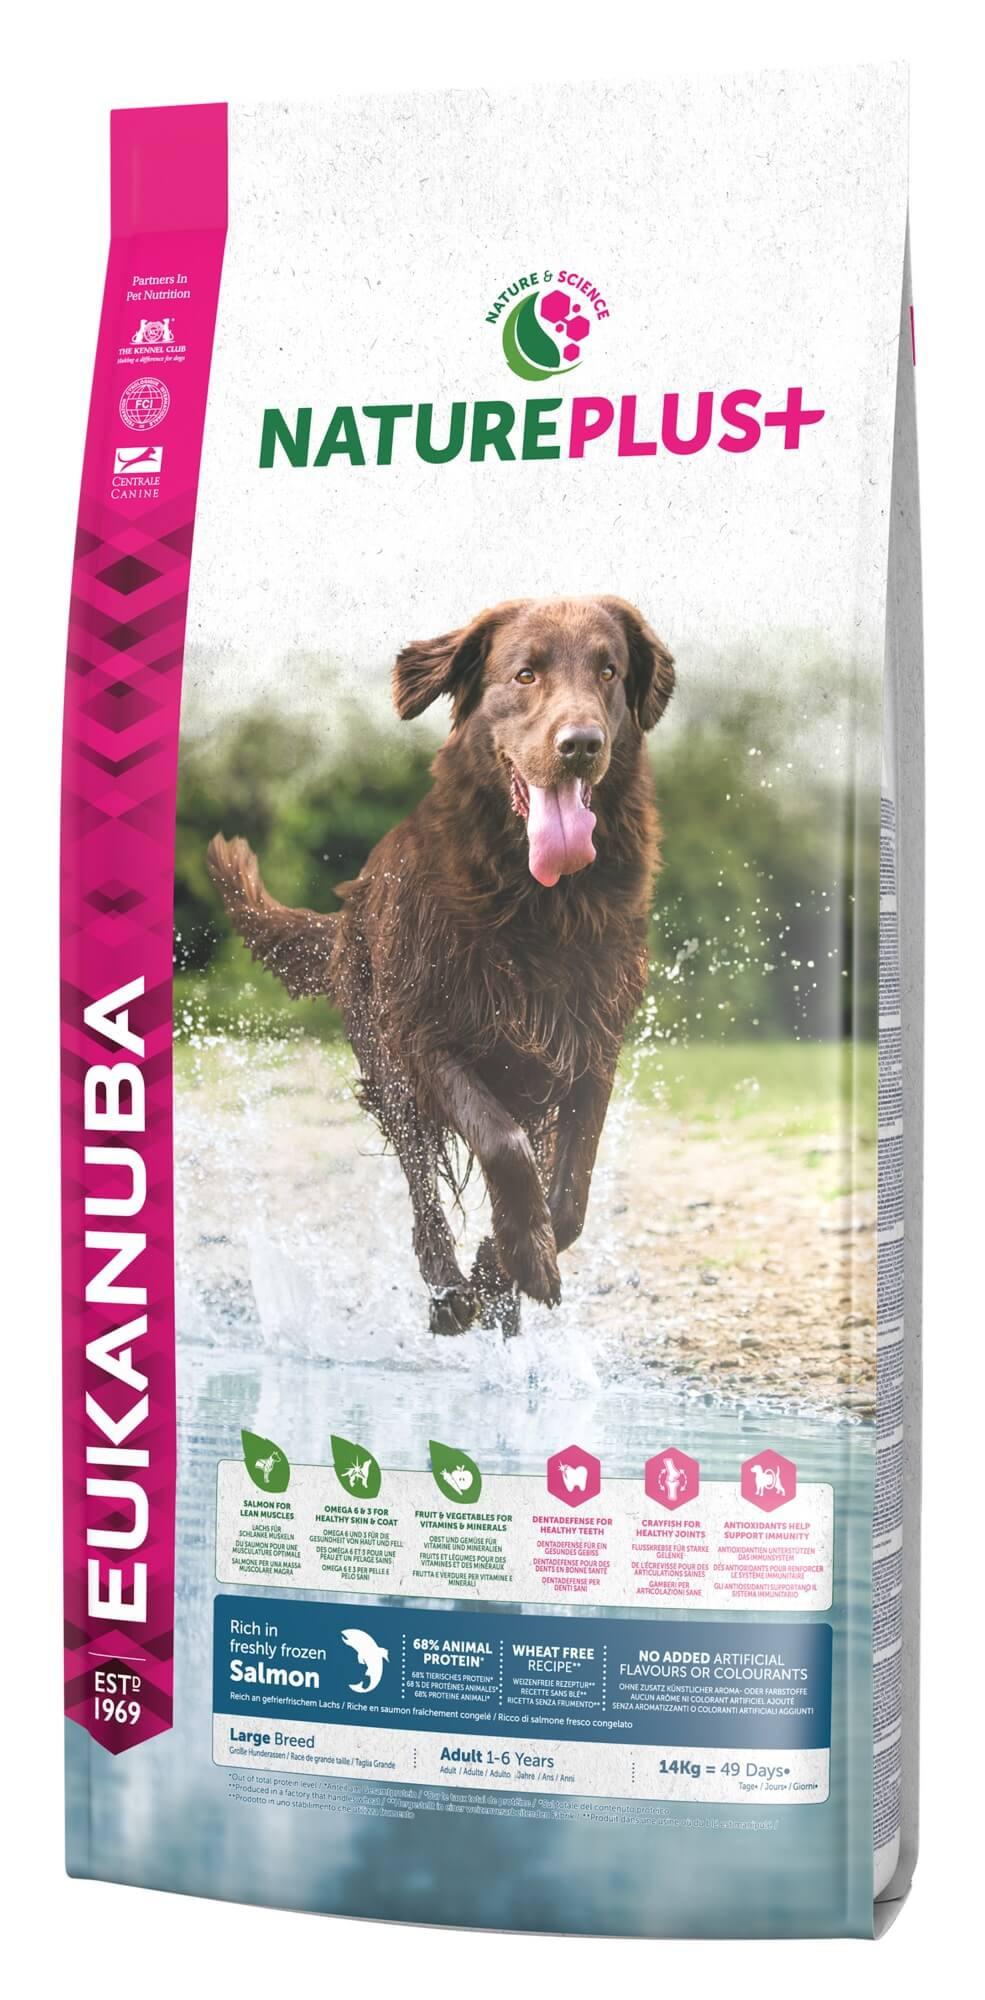 Eukanuba NaturePlus+ Adult Large Breed Zalm hondenvoer